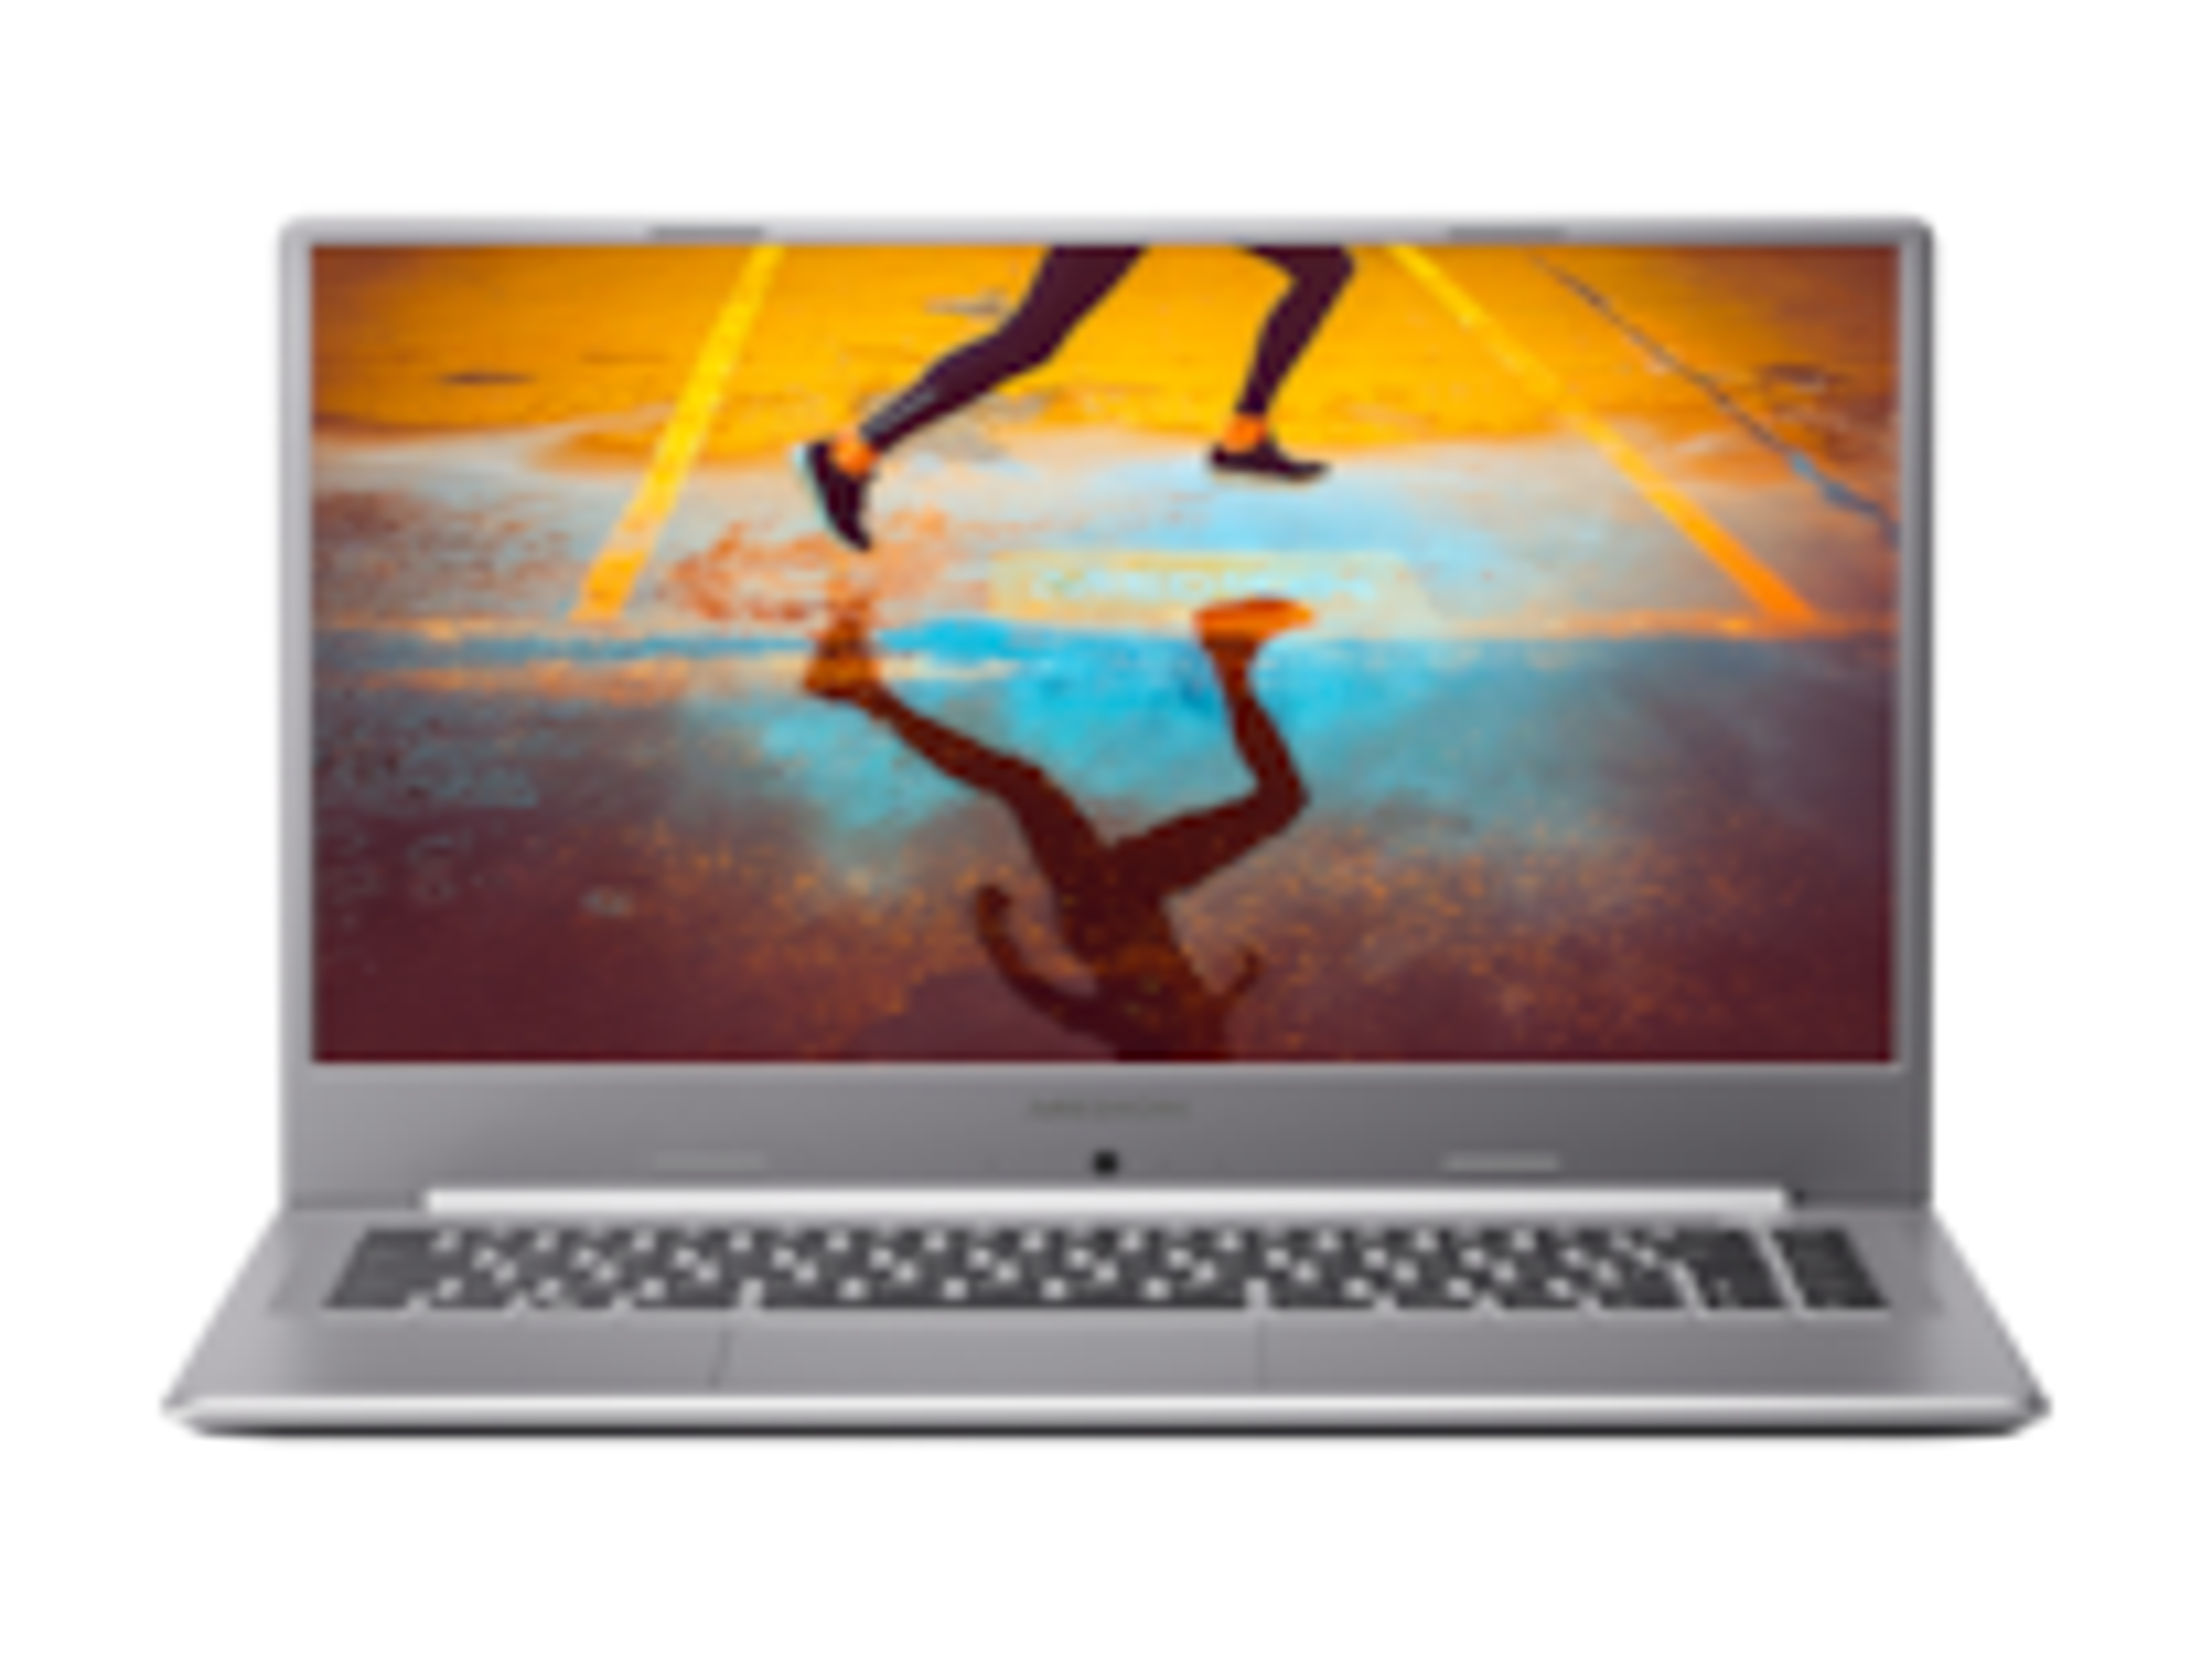 MEDION AKOYA S15447 i5 laptop